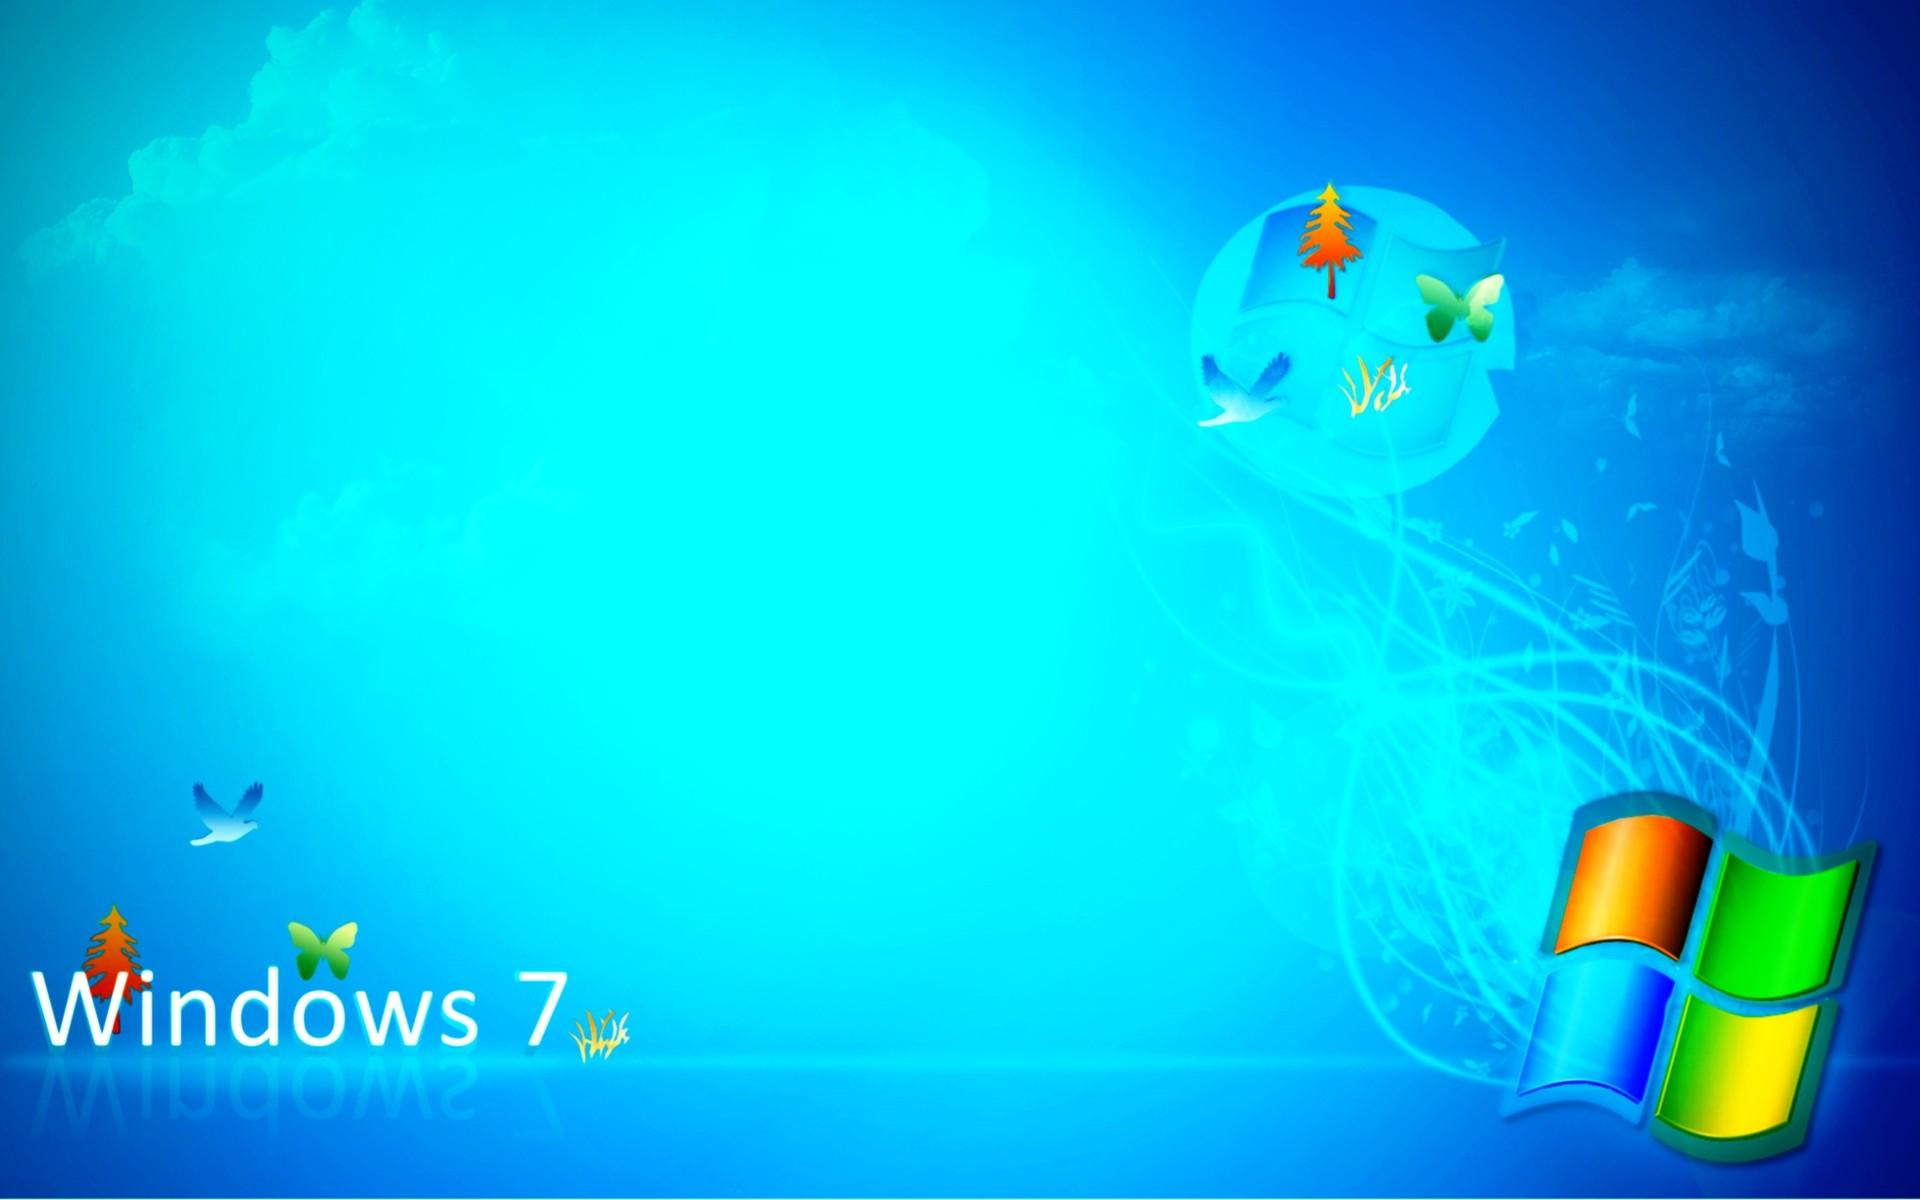 Free Download 17930 Desktop Backgrounds Windows 7 1920x1200 For Your Desktop Mobile Tablet Explore 69 Windows 7 Free Backgrounds Wallpapers For Windows 7 Free